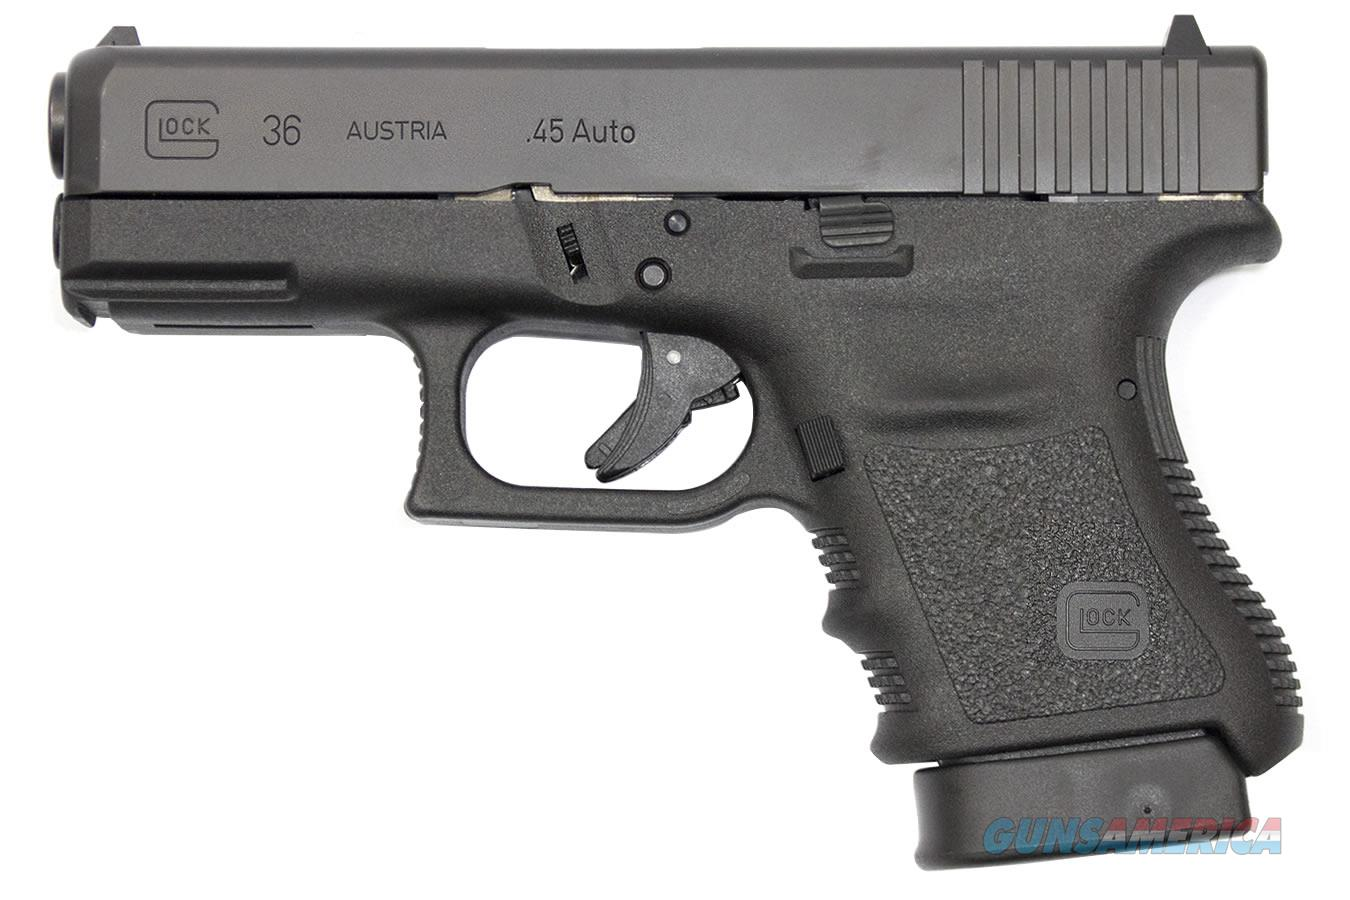 "Glock G36 Gen3 .45 ACP 3.77"" Rail 6 Rds PI3650201FGR   Guns > Pistols > Glock Pistols > 29/30/36"